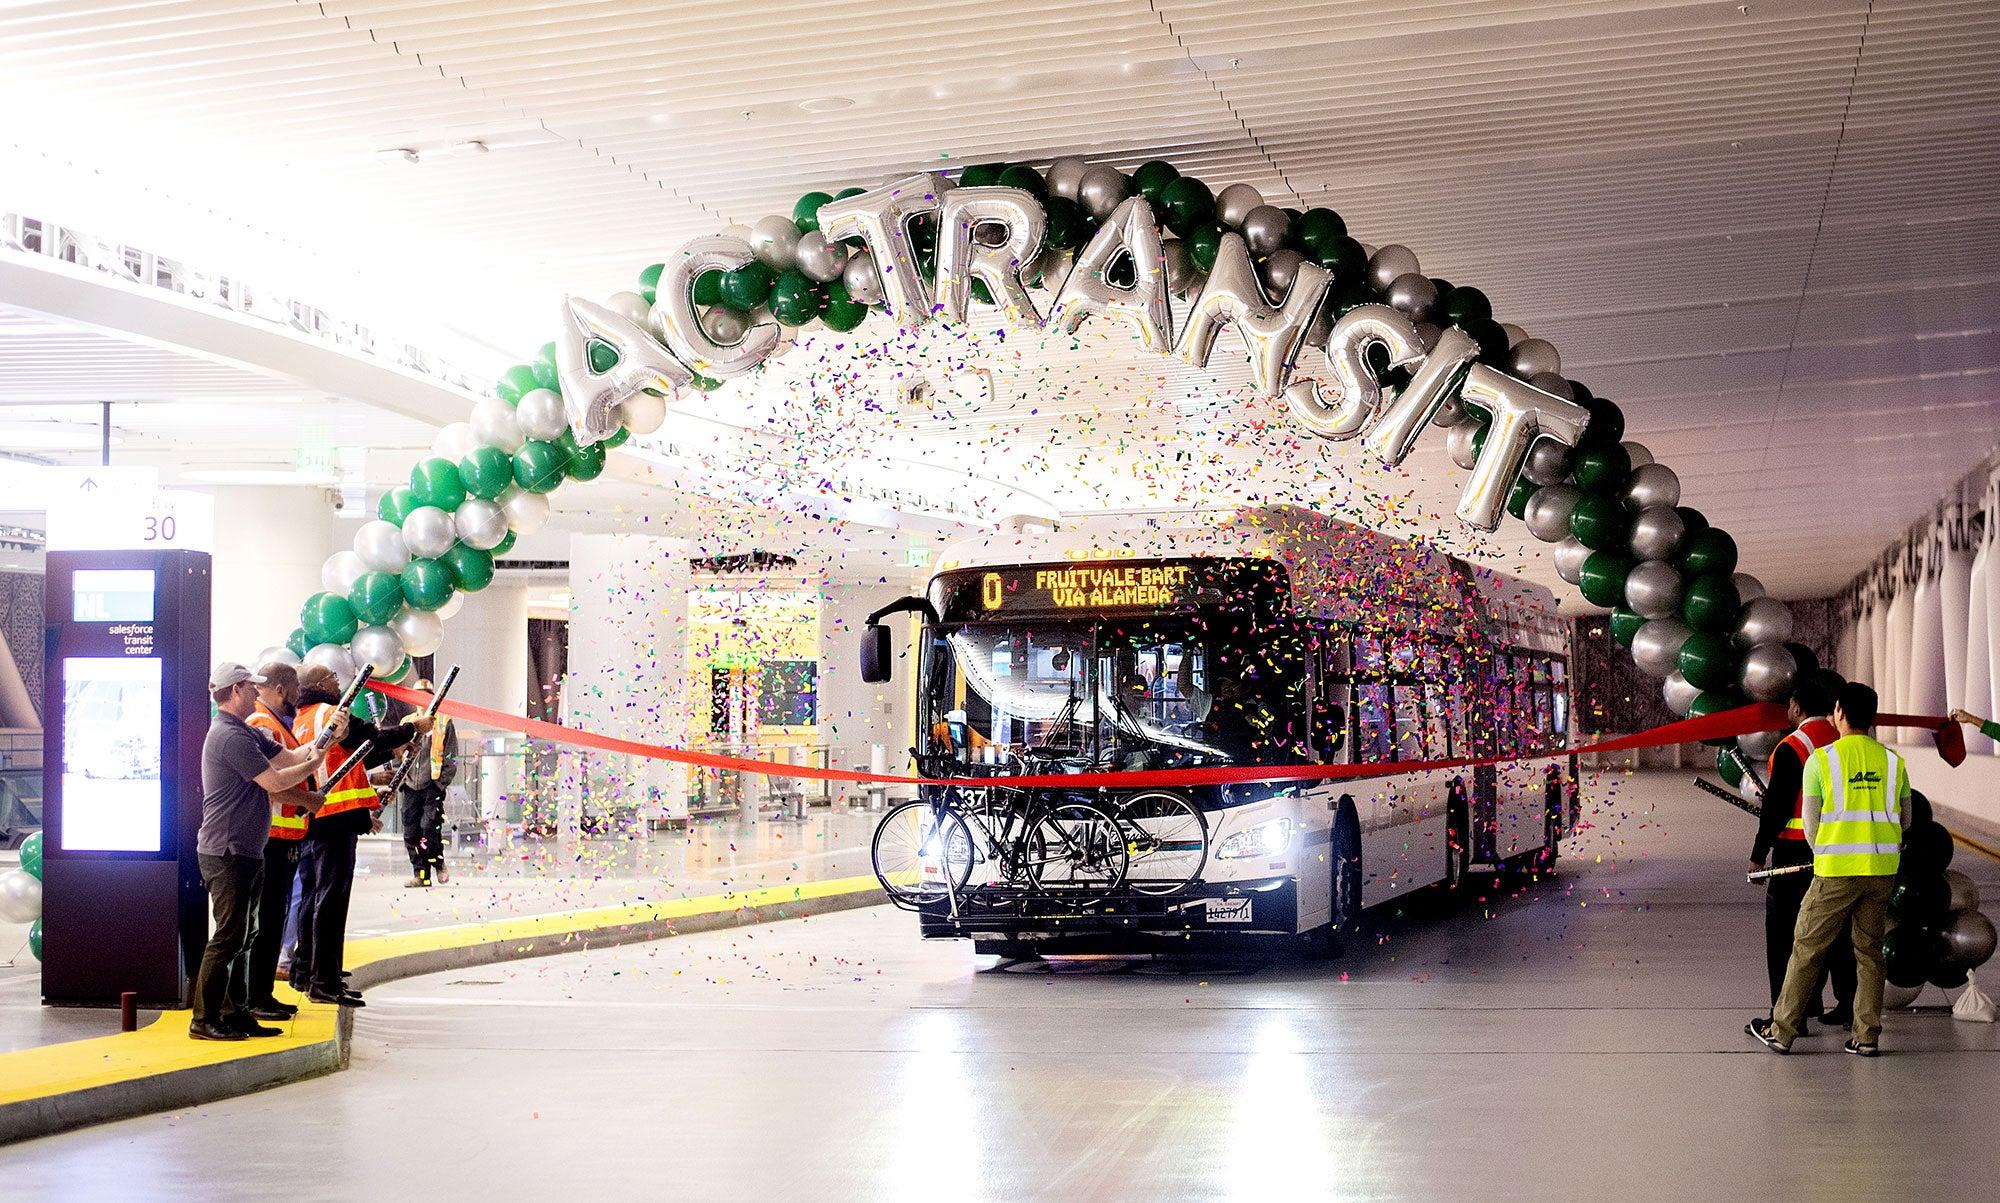 First AC Transit Bus arrives at the Salesforce Transit Center